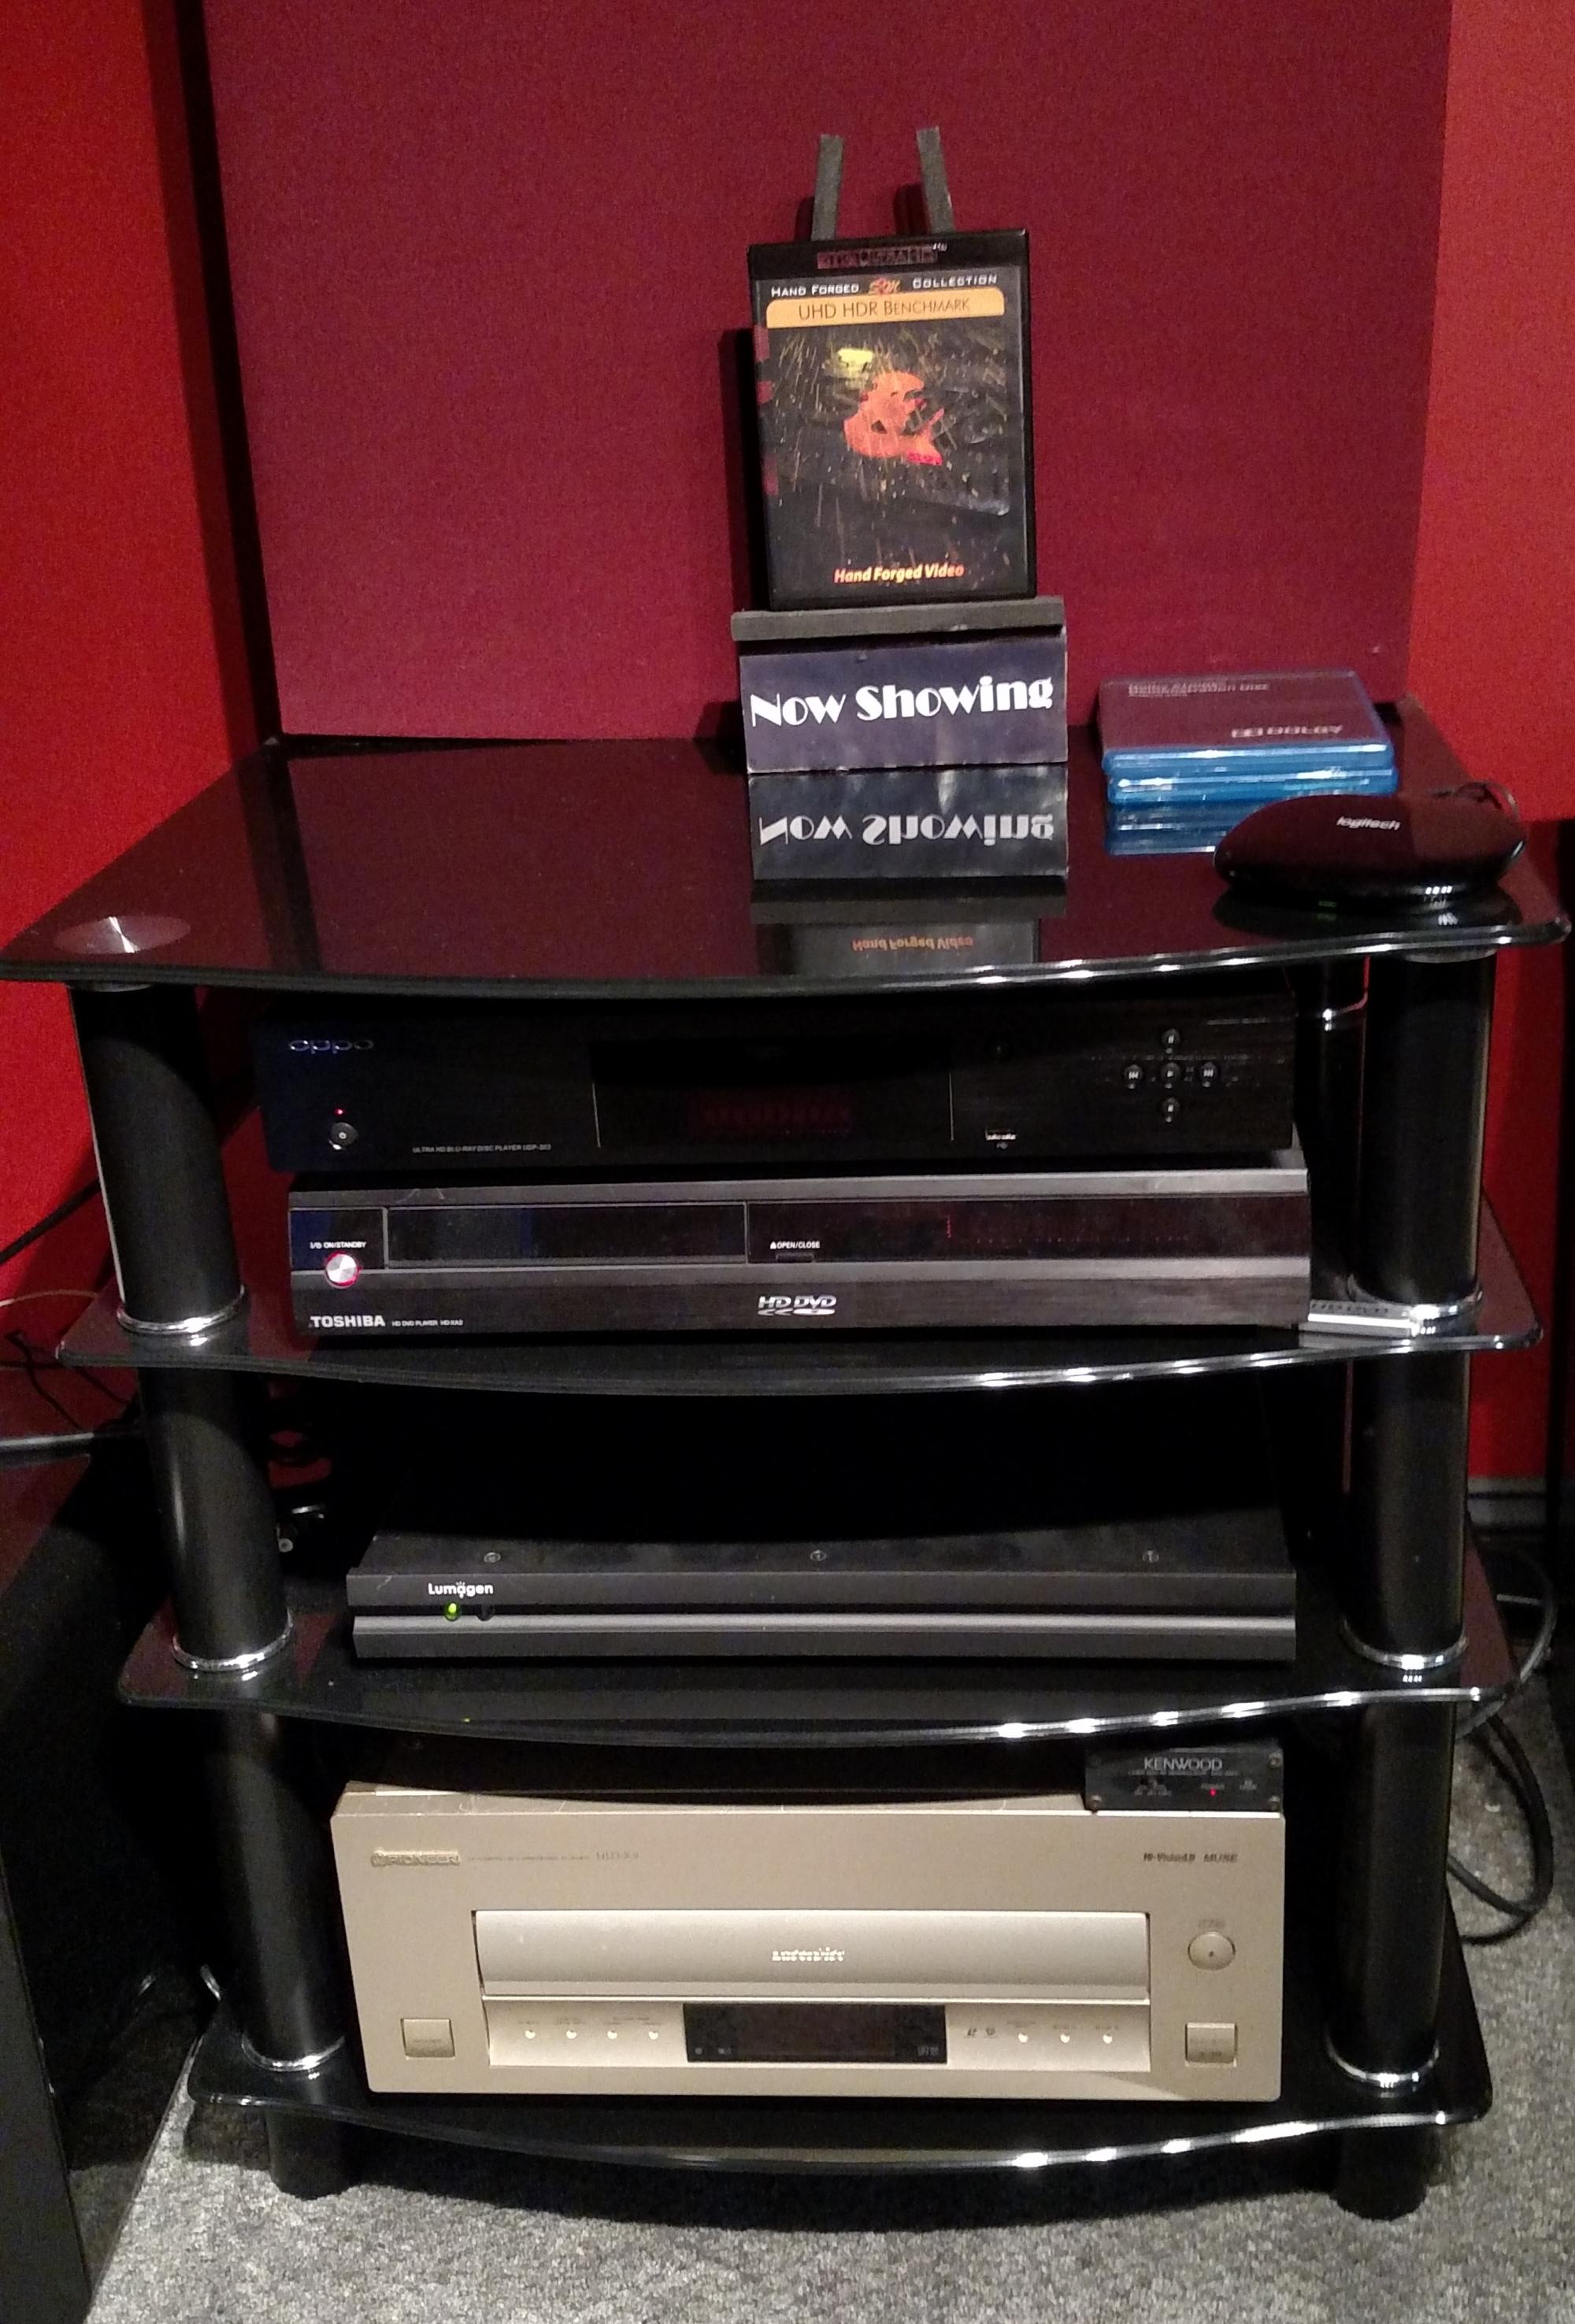 Laserdisc Player on Equipment Rack